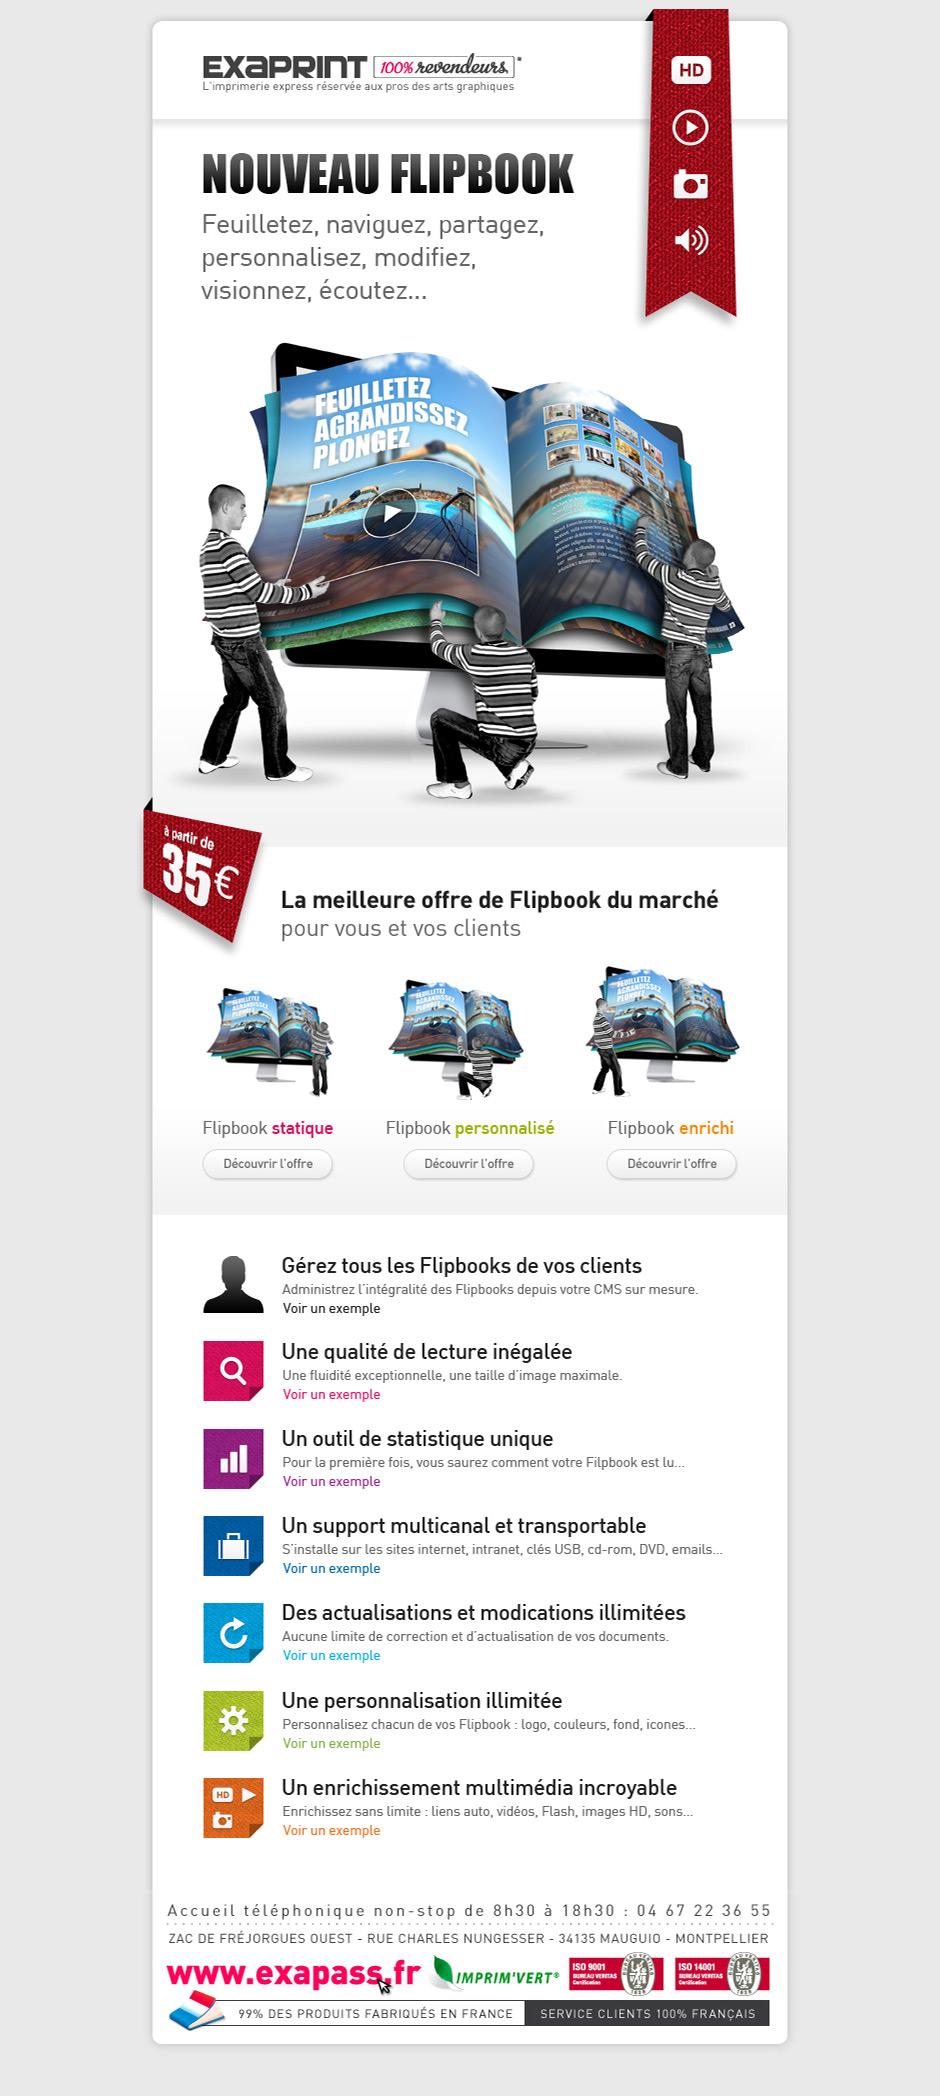 graphiste-montpellier-creation-exaprint-flipbook-agence-communication-montpellier-caconcept-alexis-cretin-3